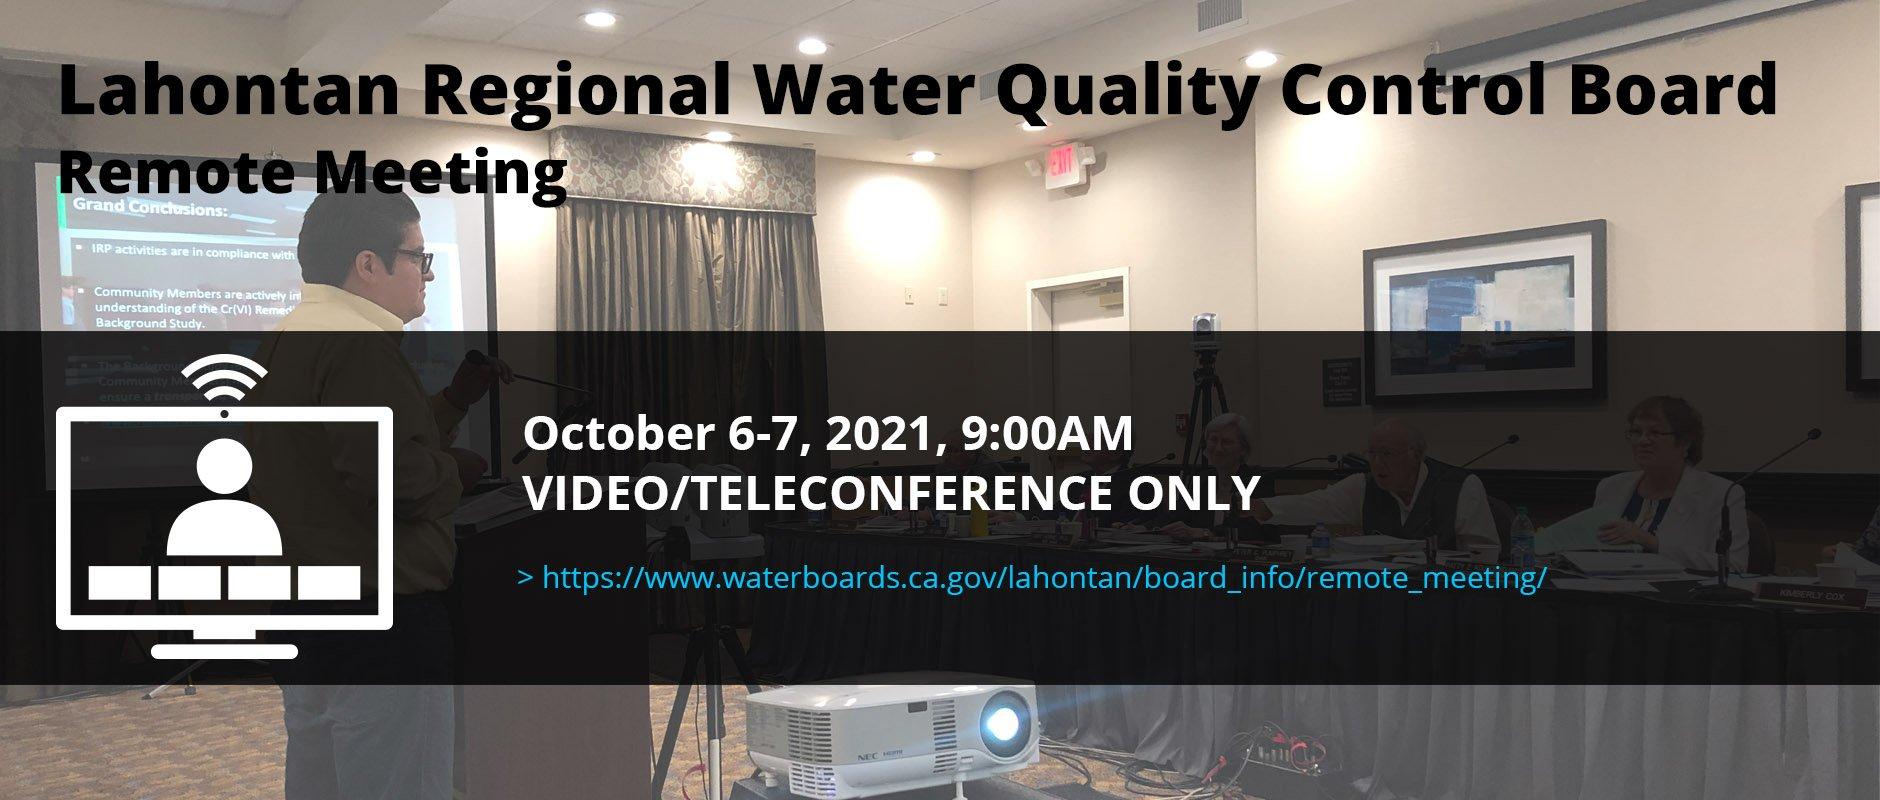 Quarterly Hinkley Community Meeting, October 6-7, 2021